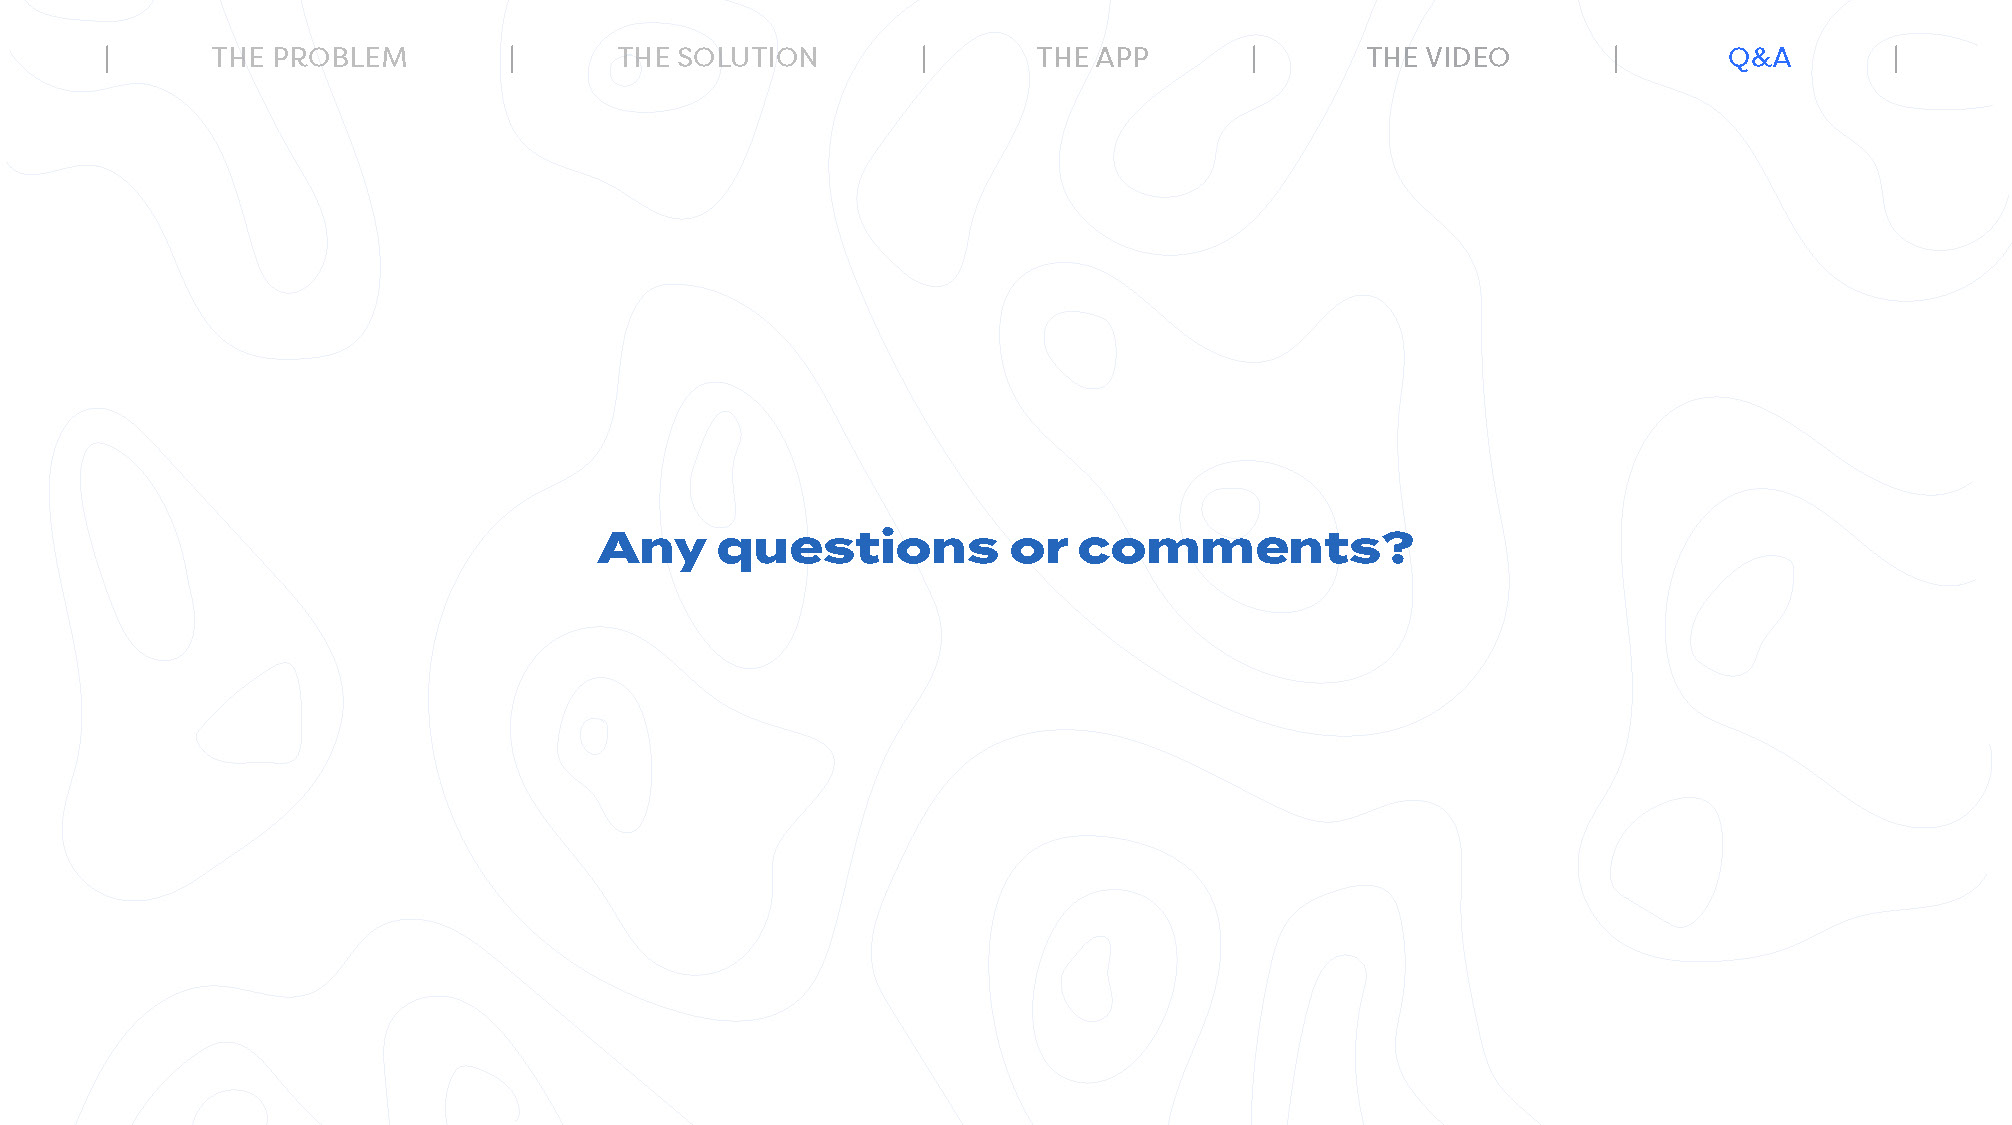 EXC3_Trippin_Presentation_FINAL_Page_40.jpg